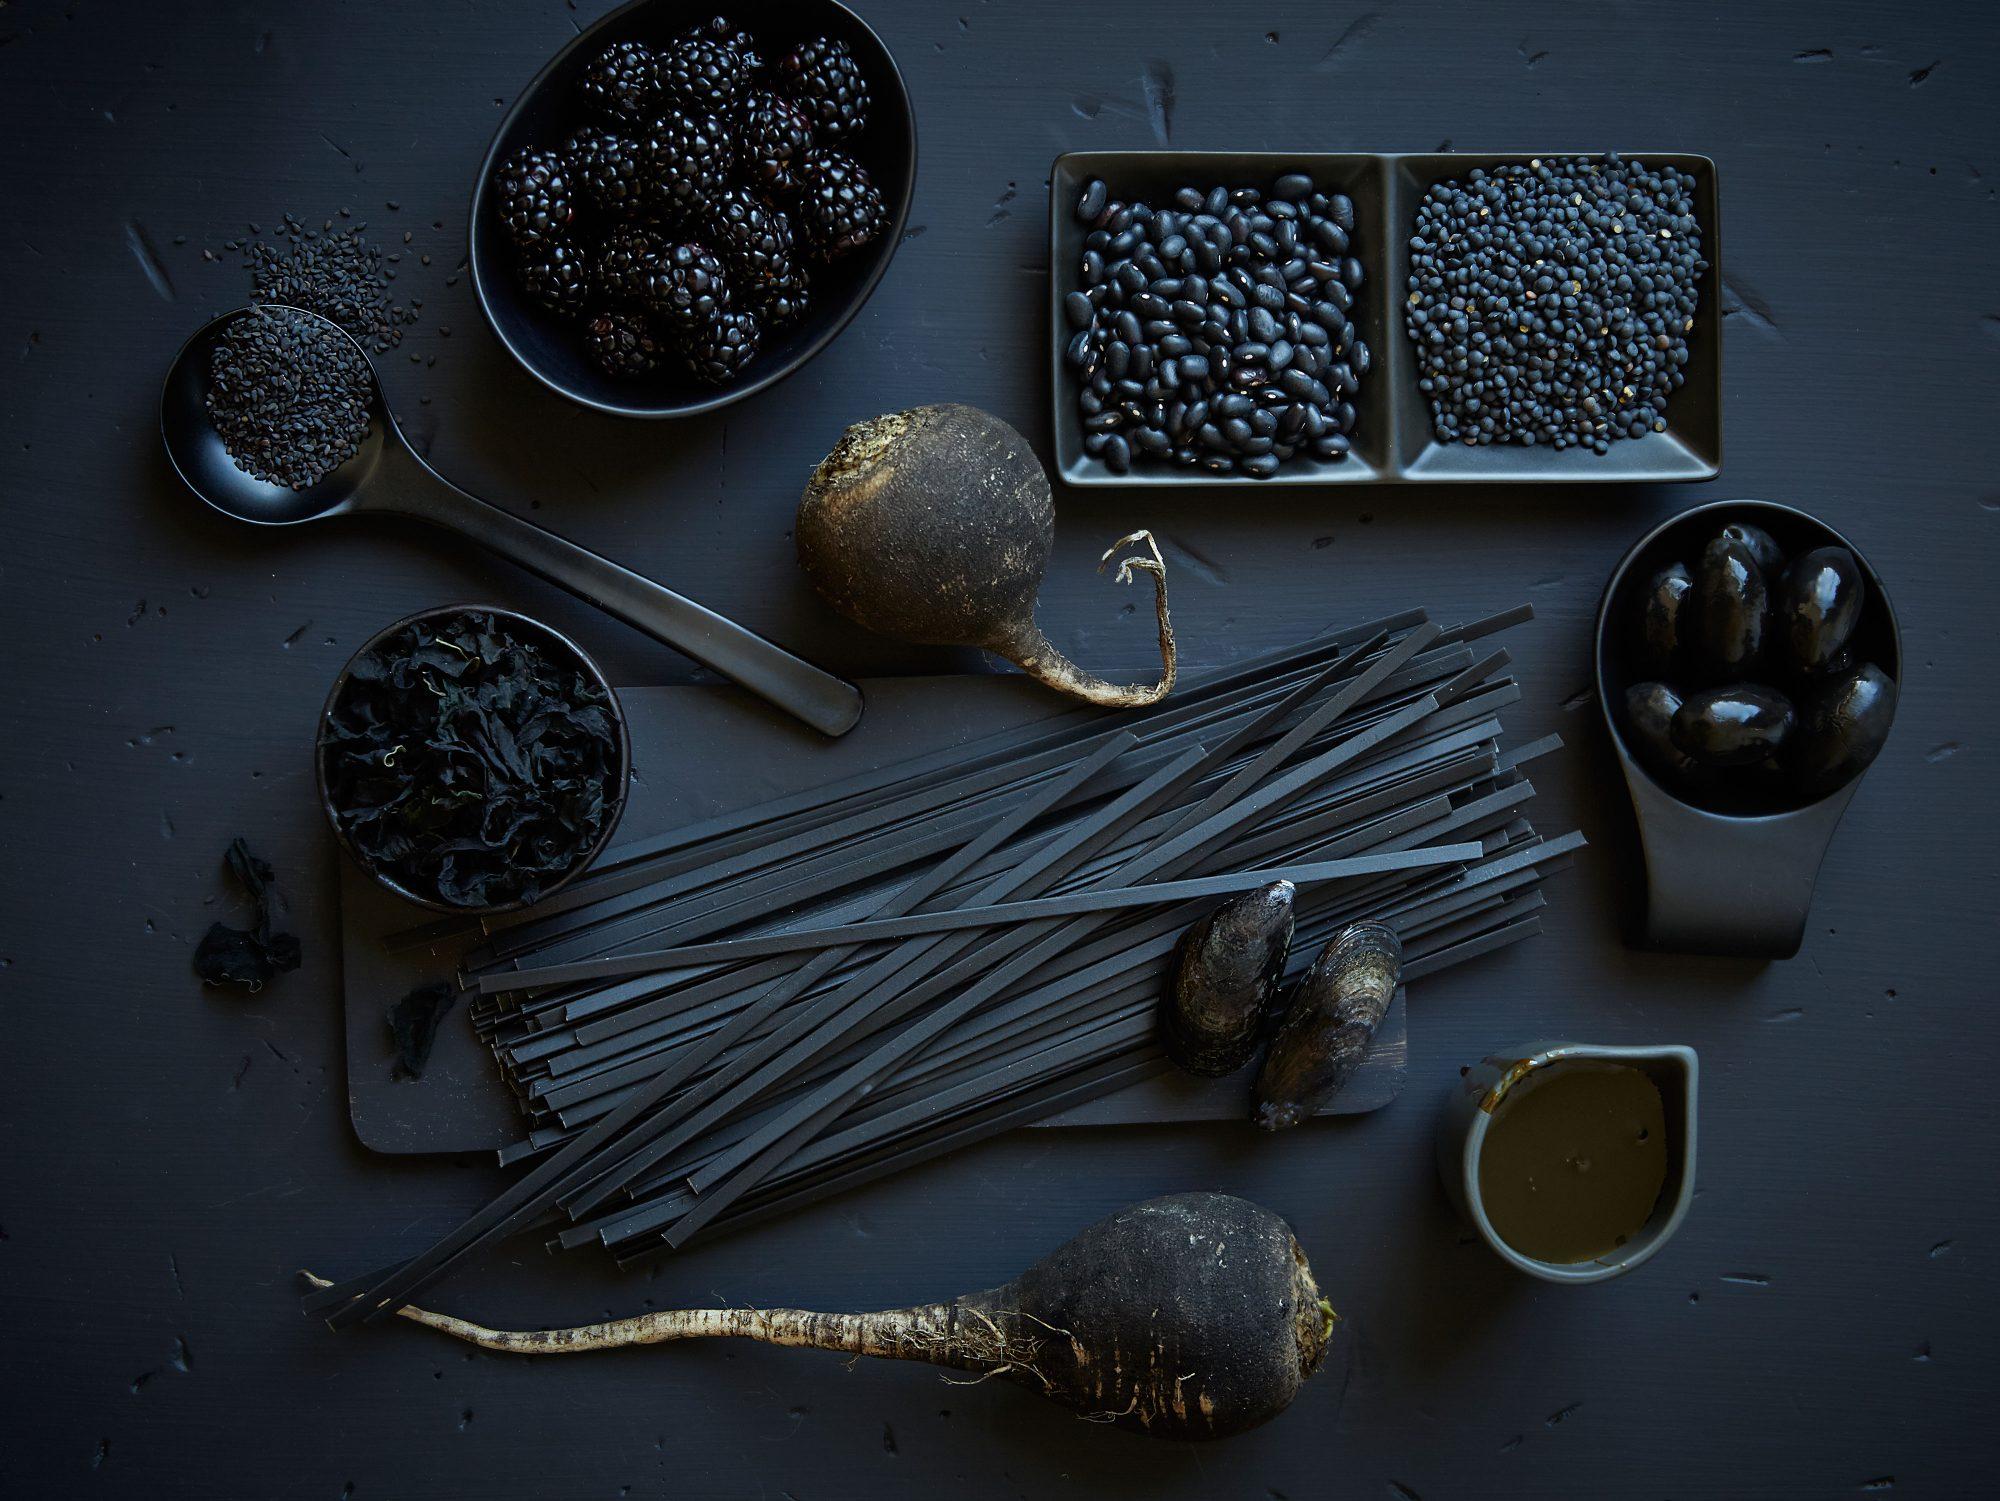 6 All Black Foods For A Deliciously Dark Halloween Spread Myrecipes